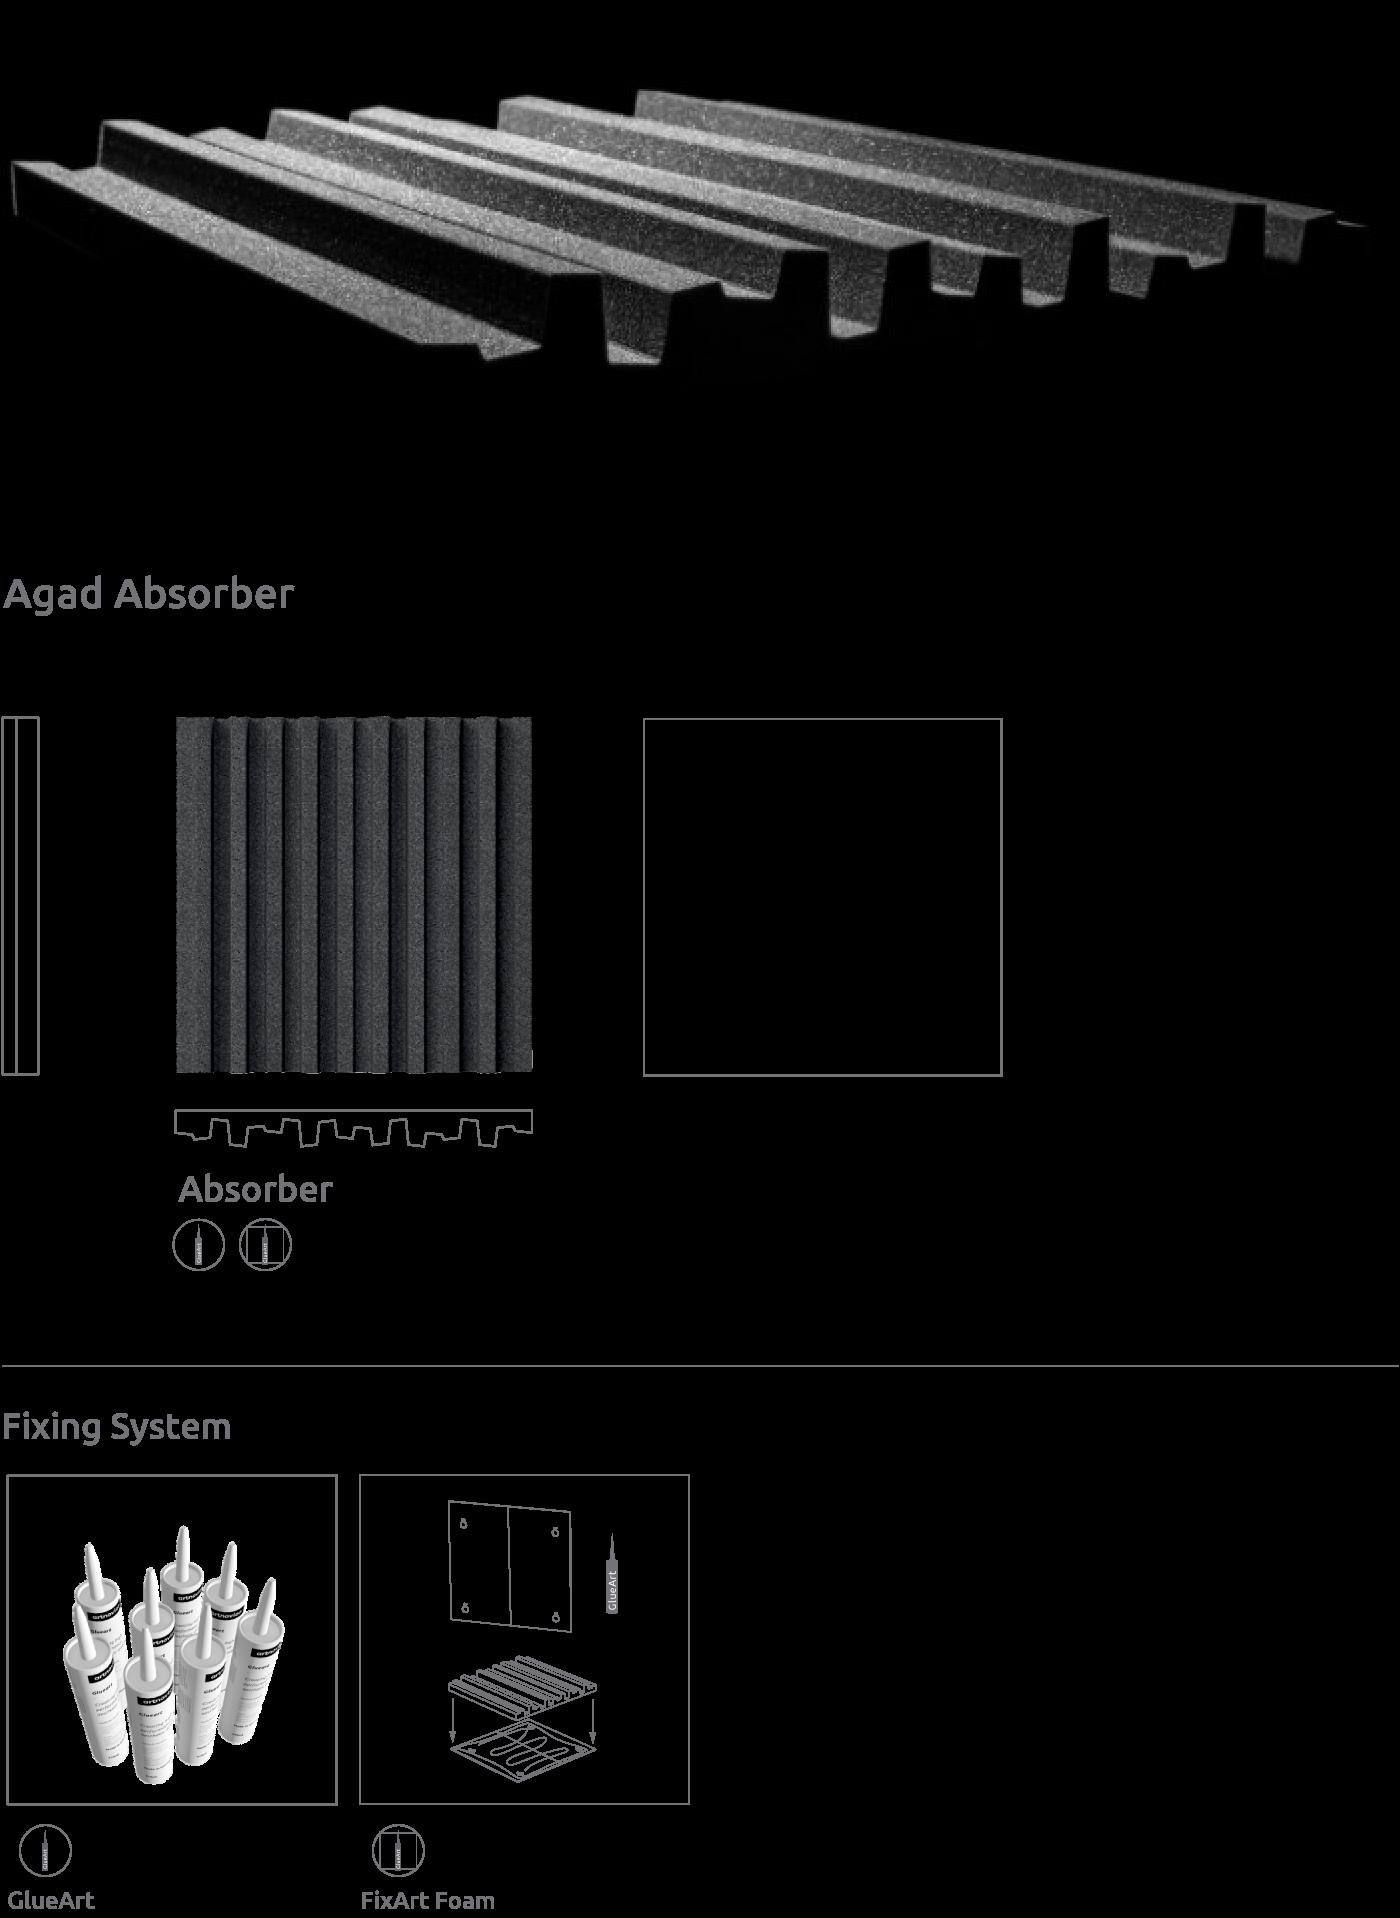 Artnovion product agad absorber 465bfc5608